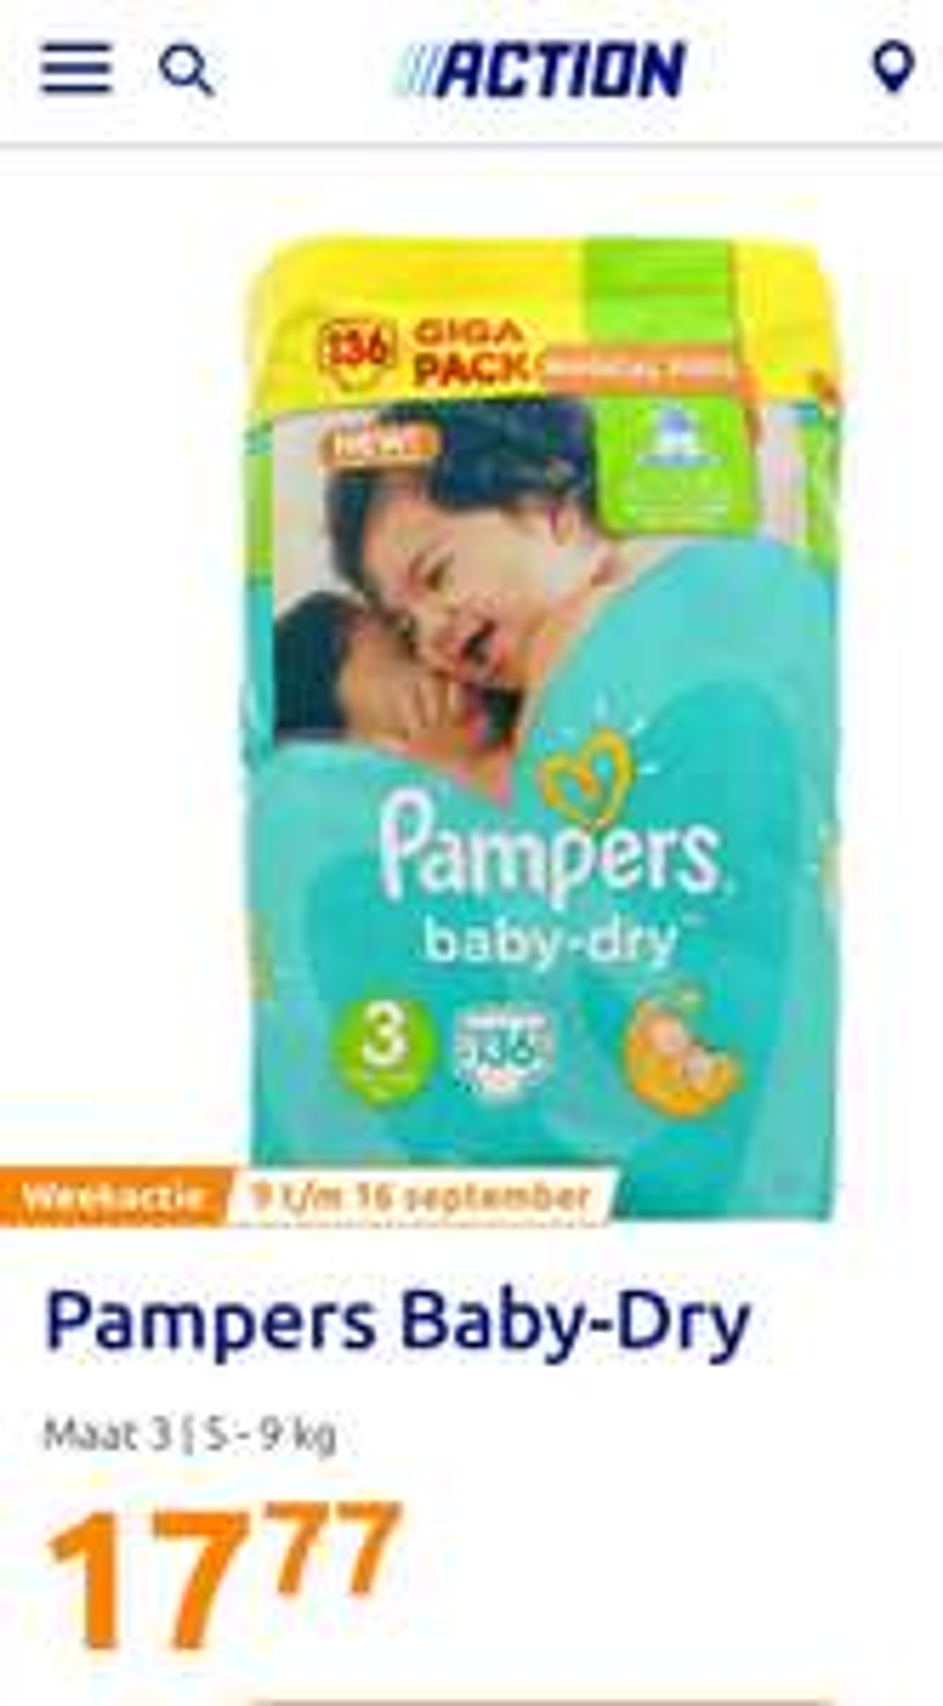 Giga pak Pampers Baby Dry maat 3 t/m 6